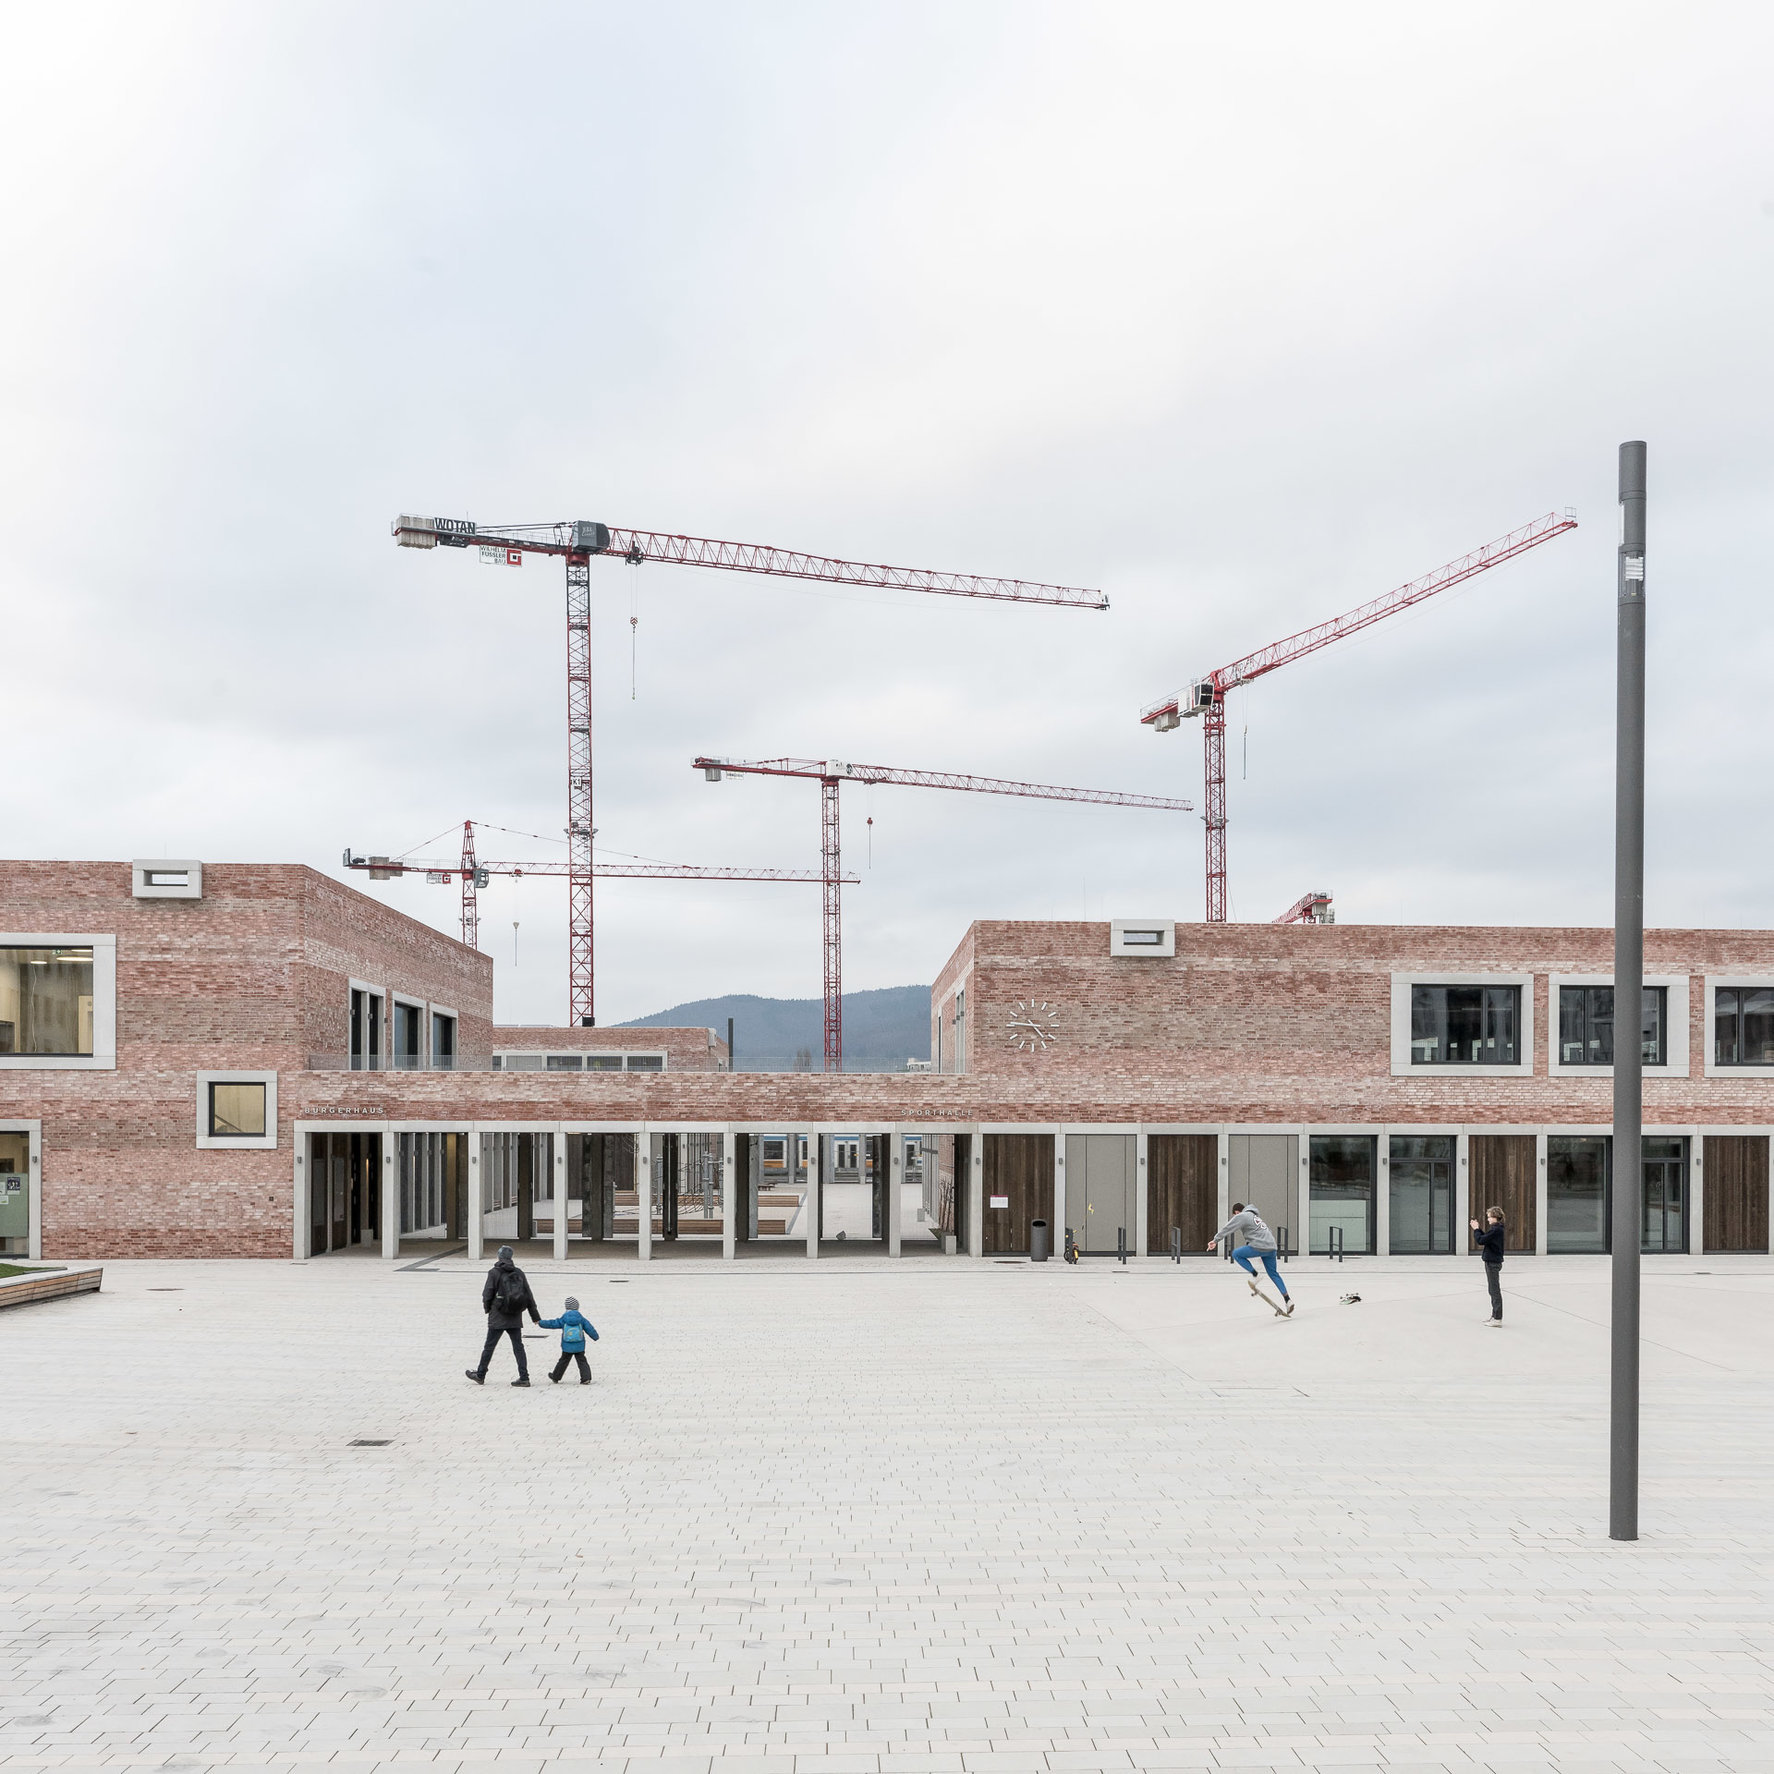 Bahnstadt_10-02-2018-2.jpg